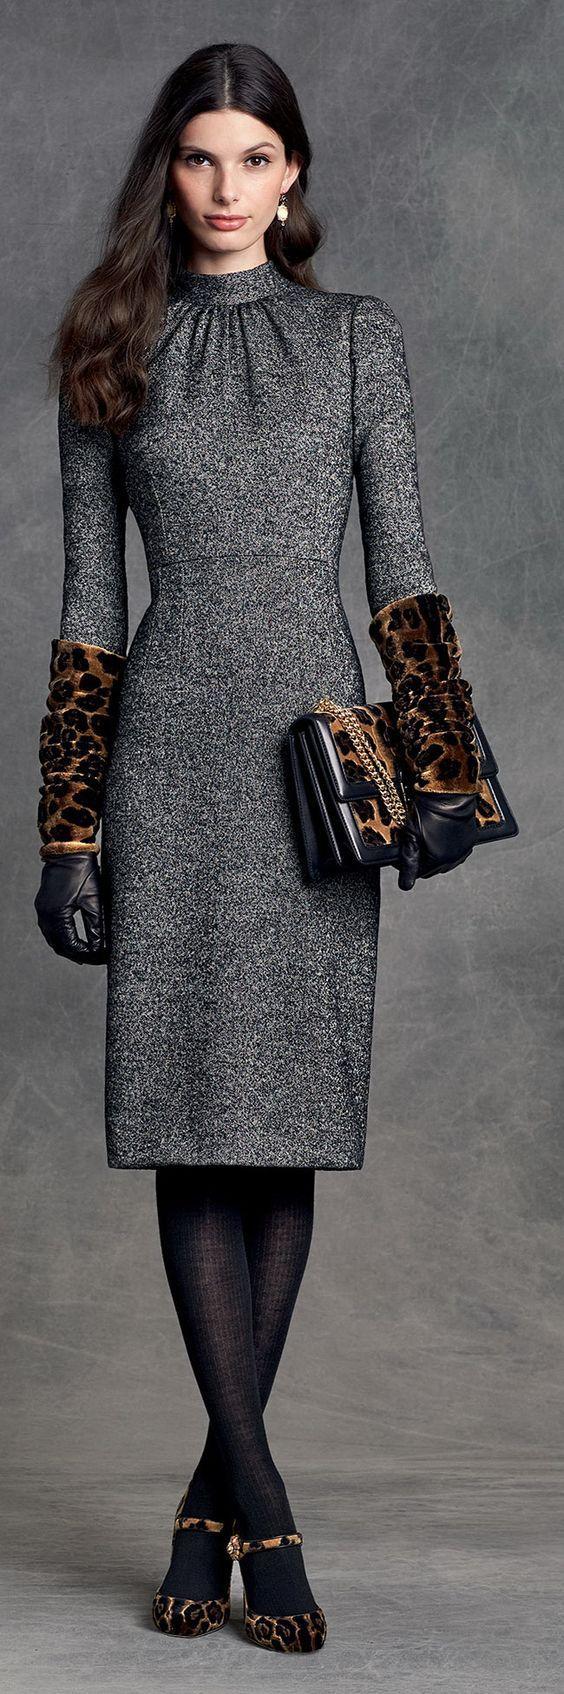 leopard-fashion-mannequin-feminin